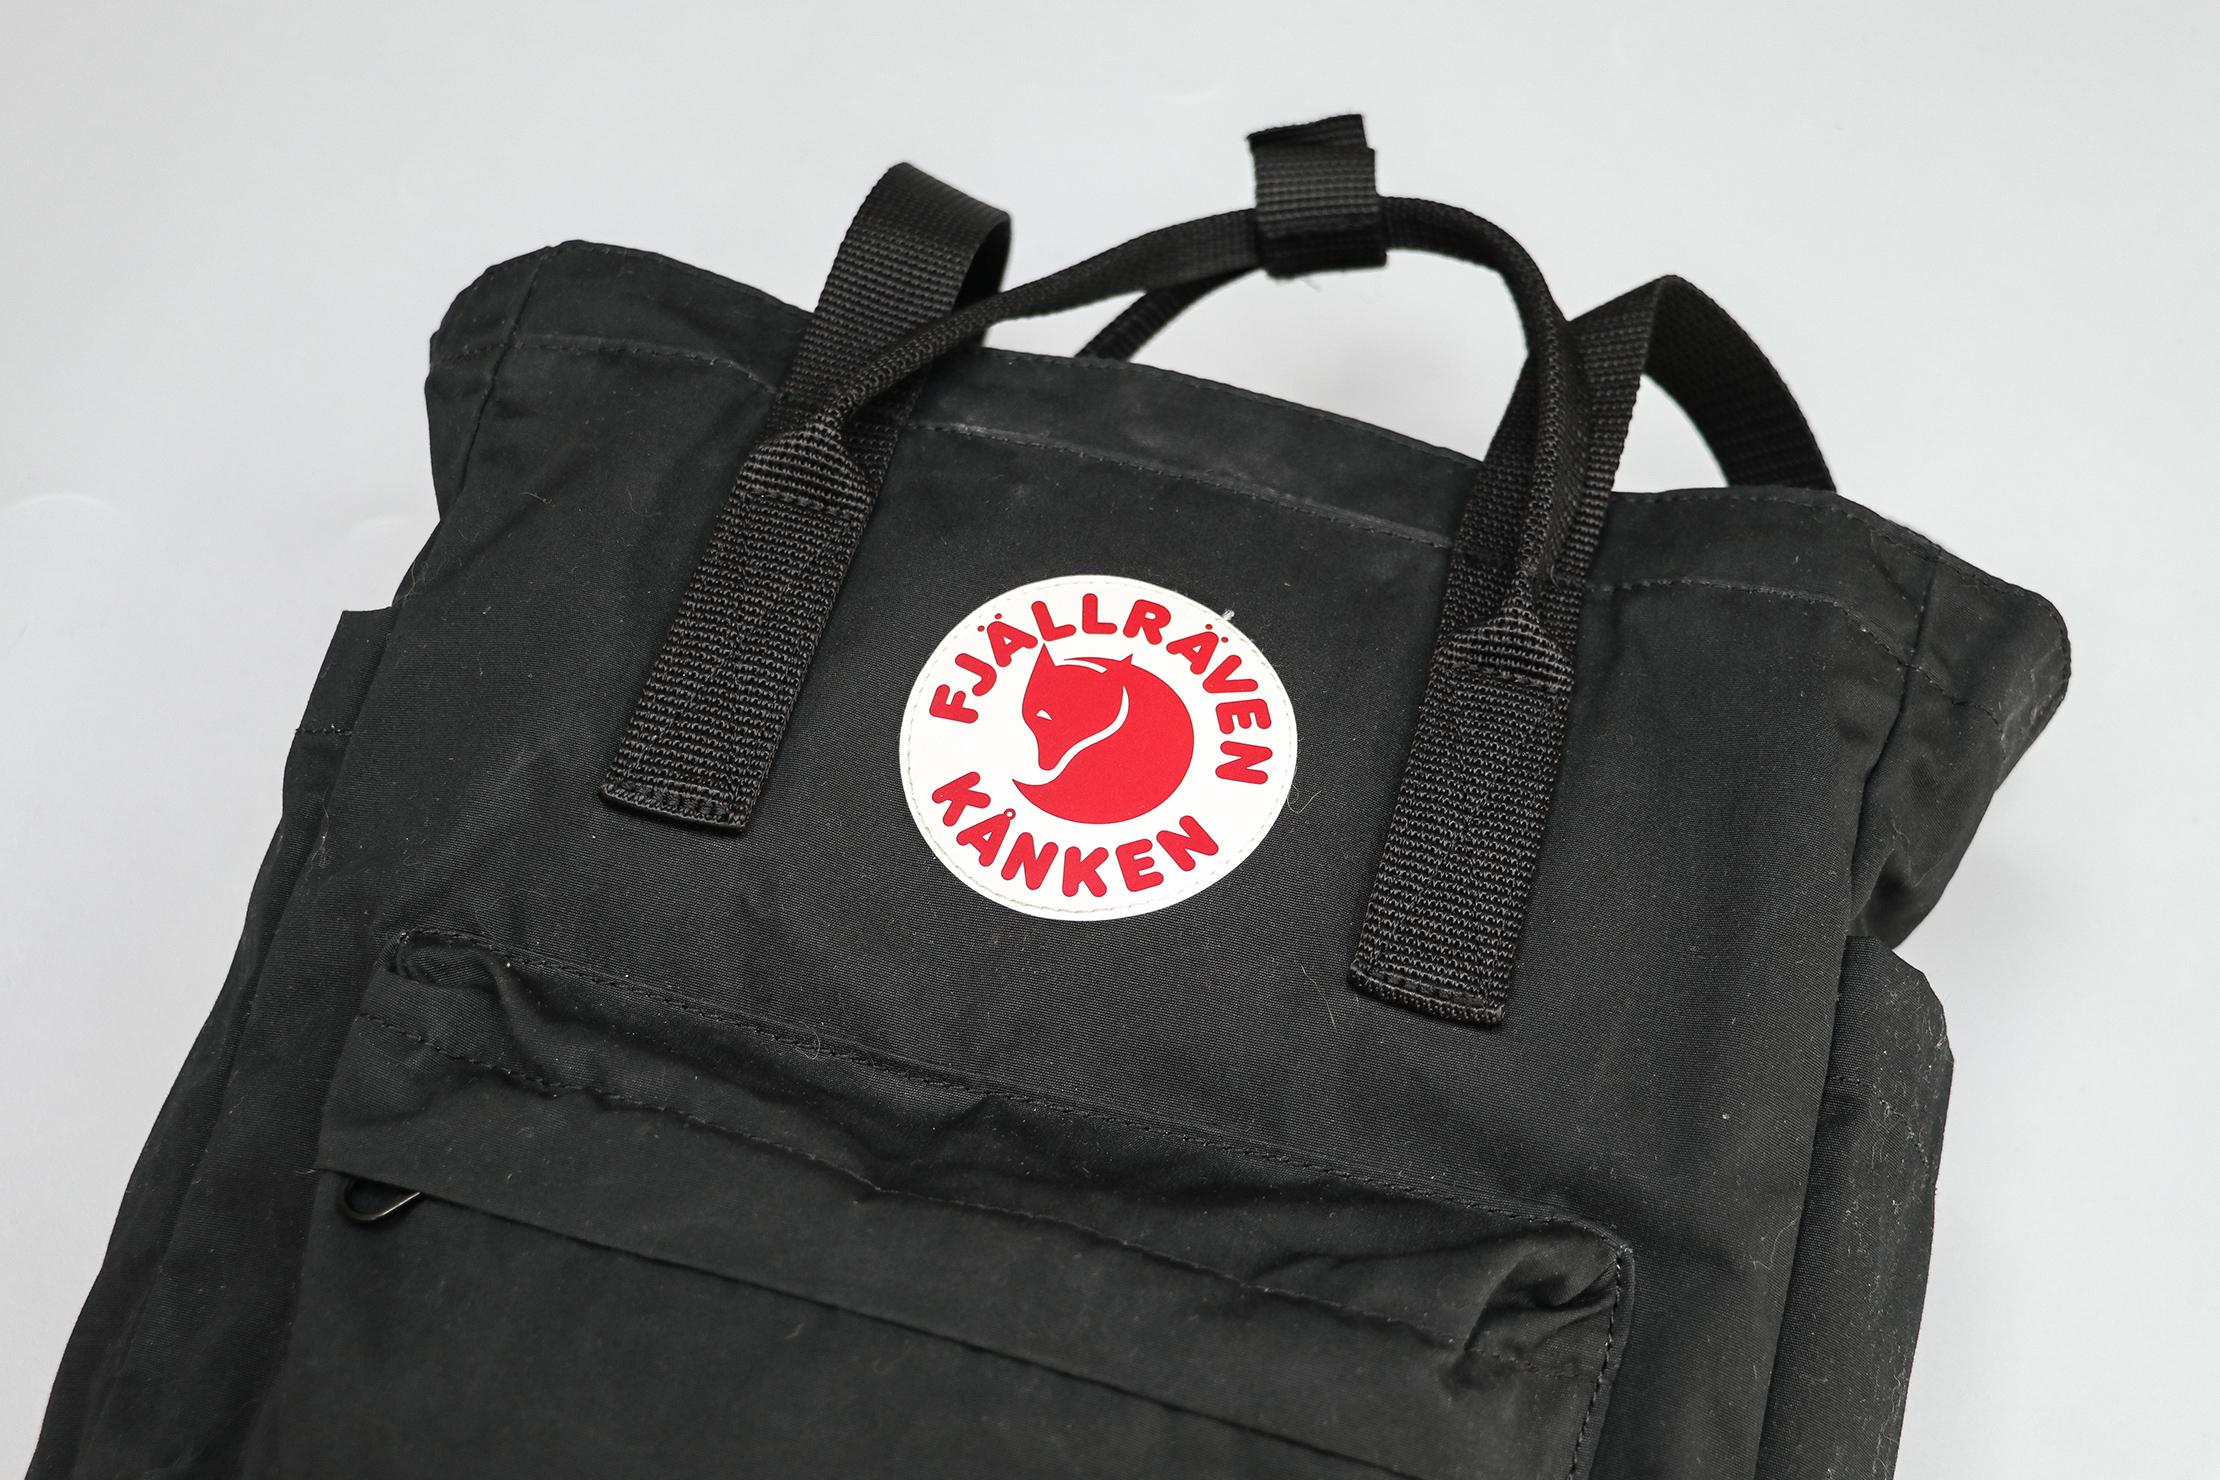 Fjallraven Kanken Totepack Material & Logo